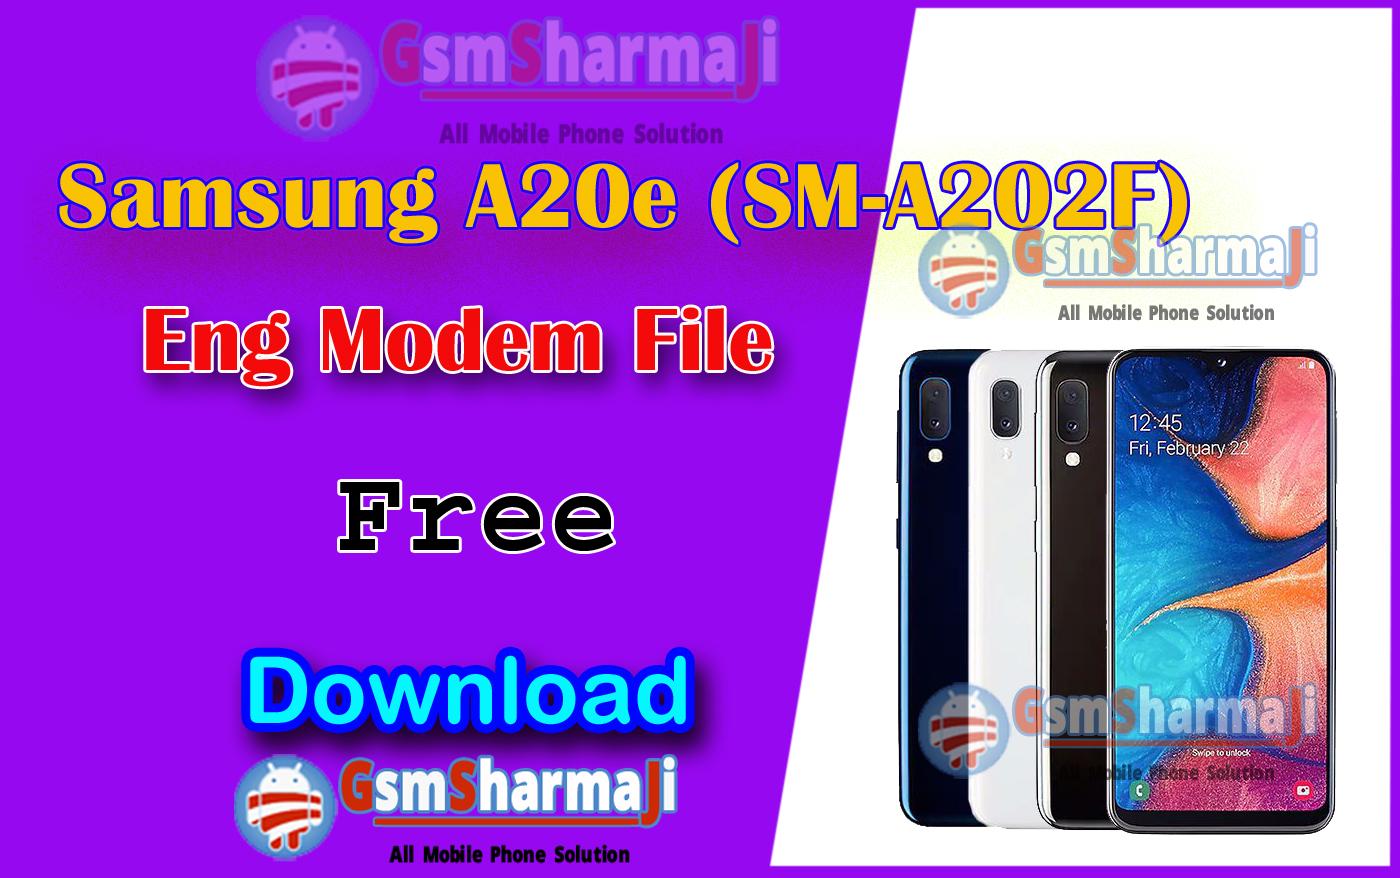 Samsung A20e (SM-A202F) U2-U3 Eng Modem File-Firmware Download